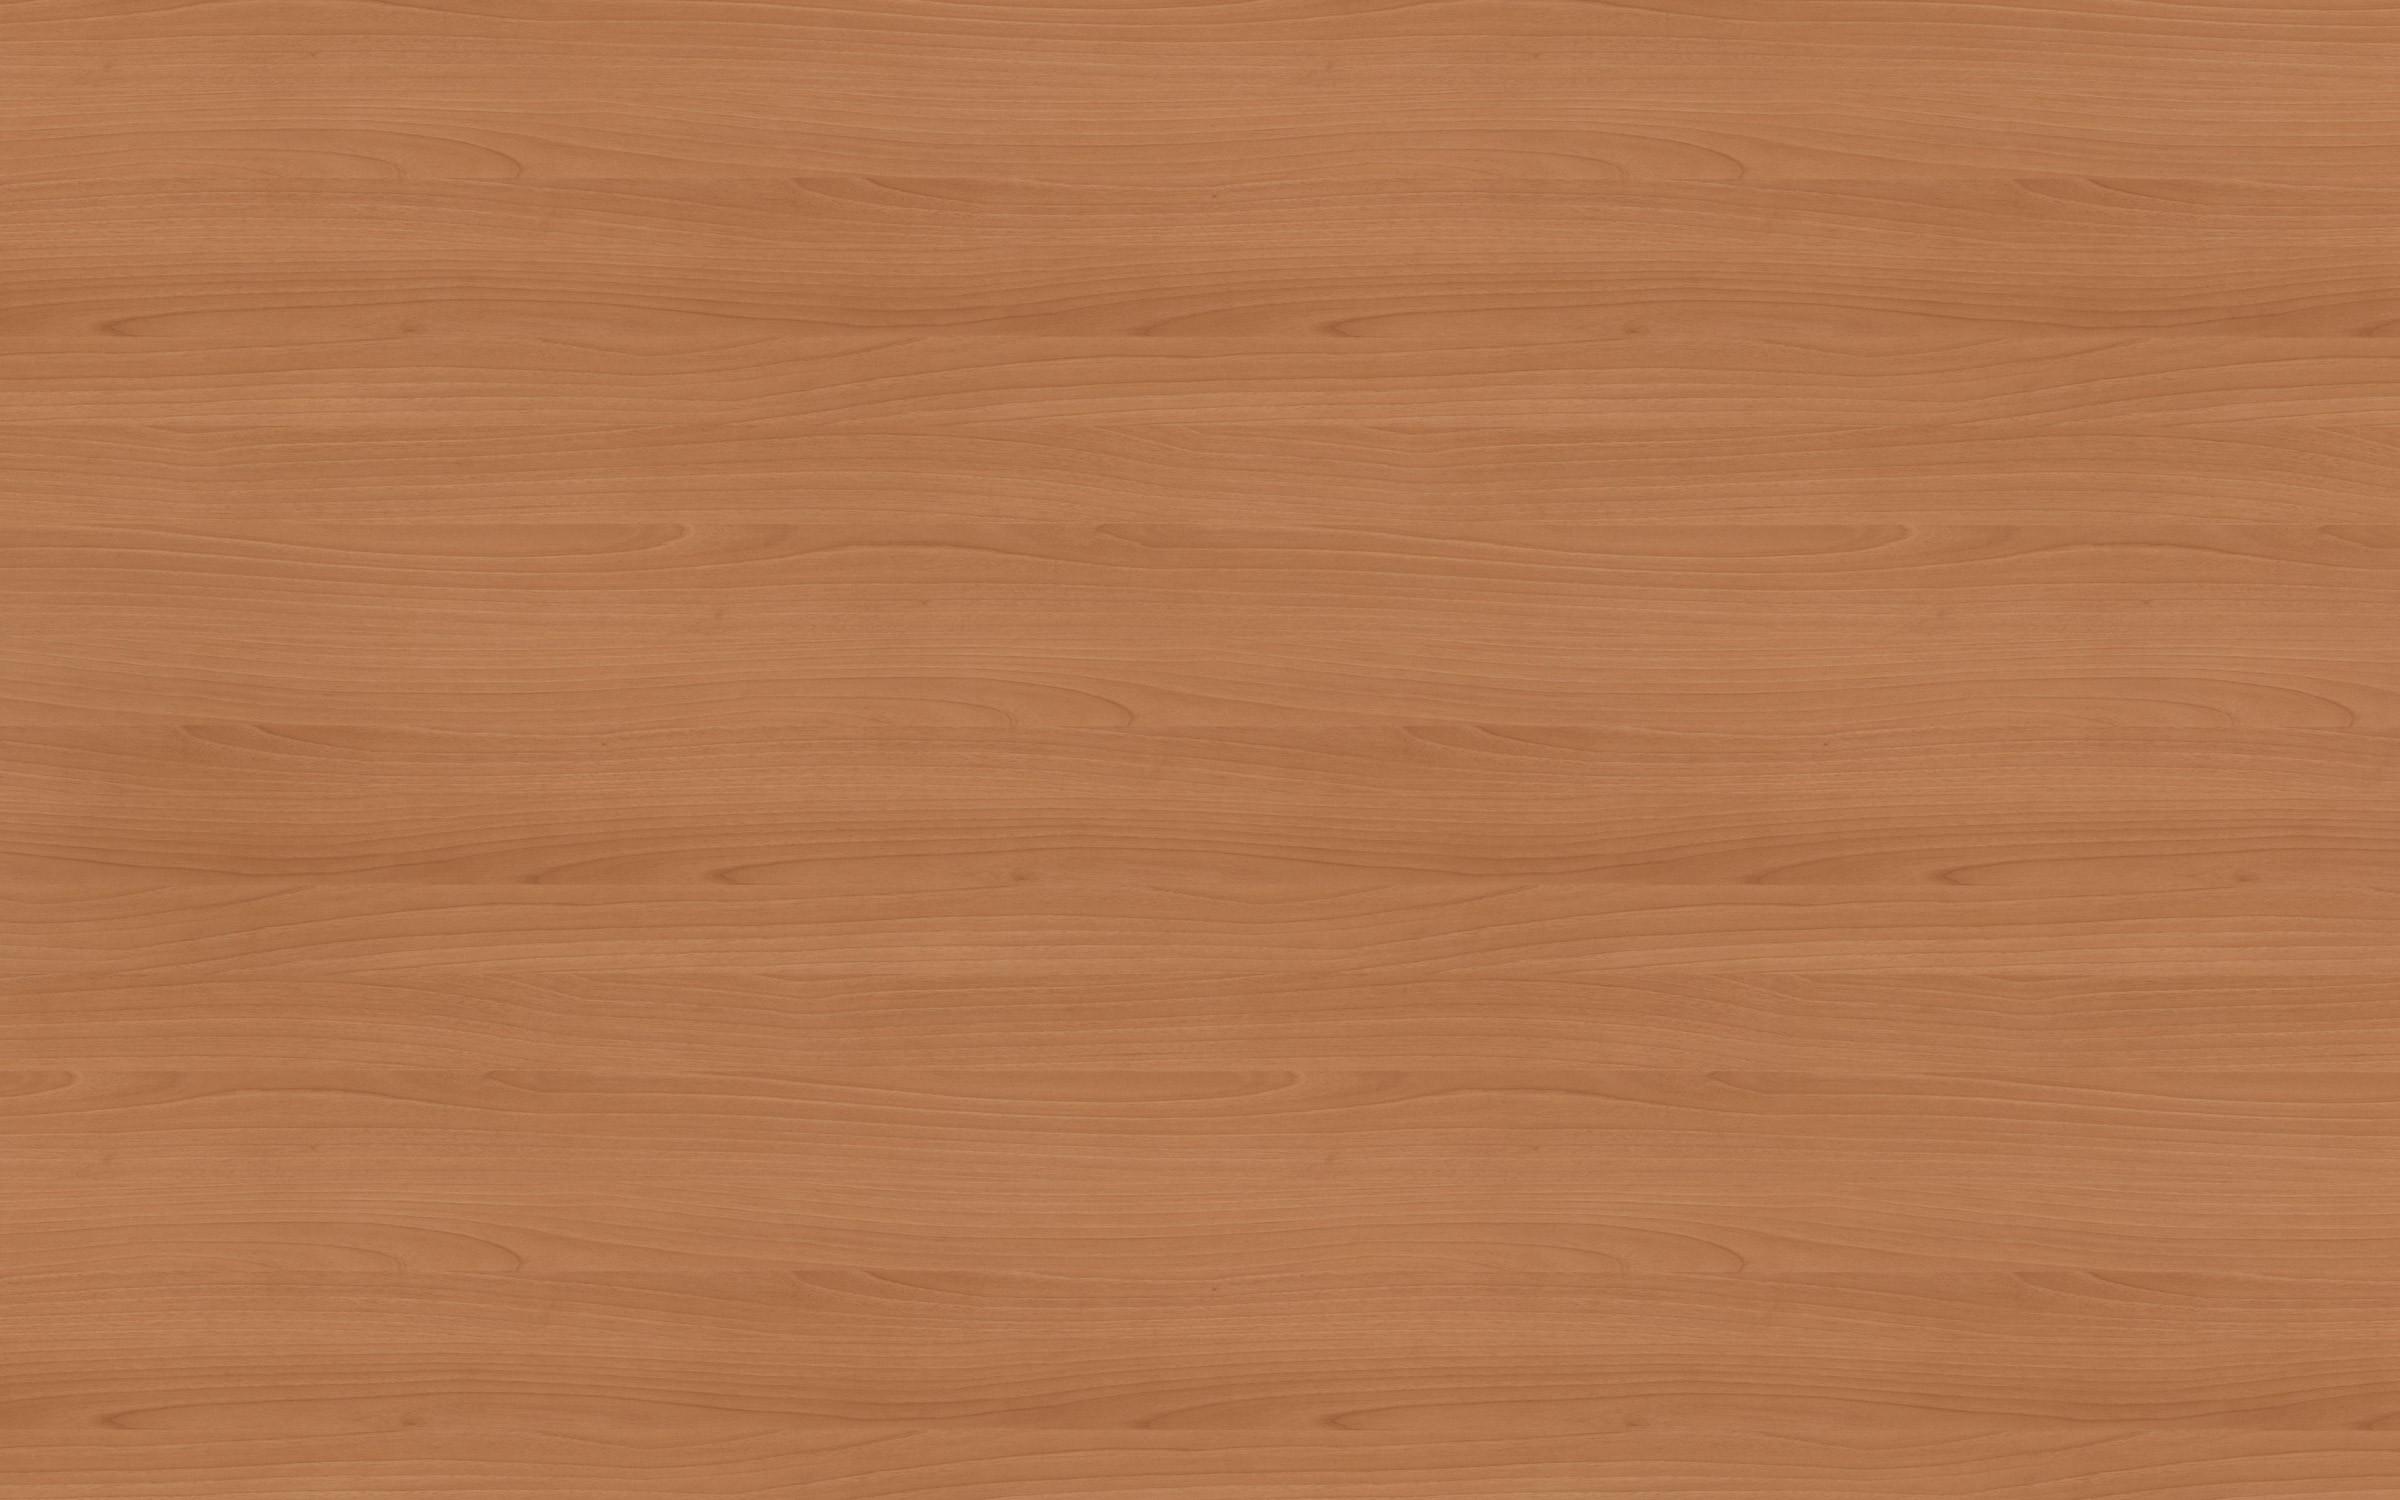 7921 Tuscan Walnut Laminate Countertops